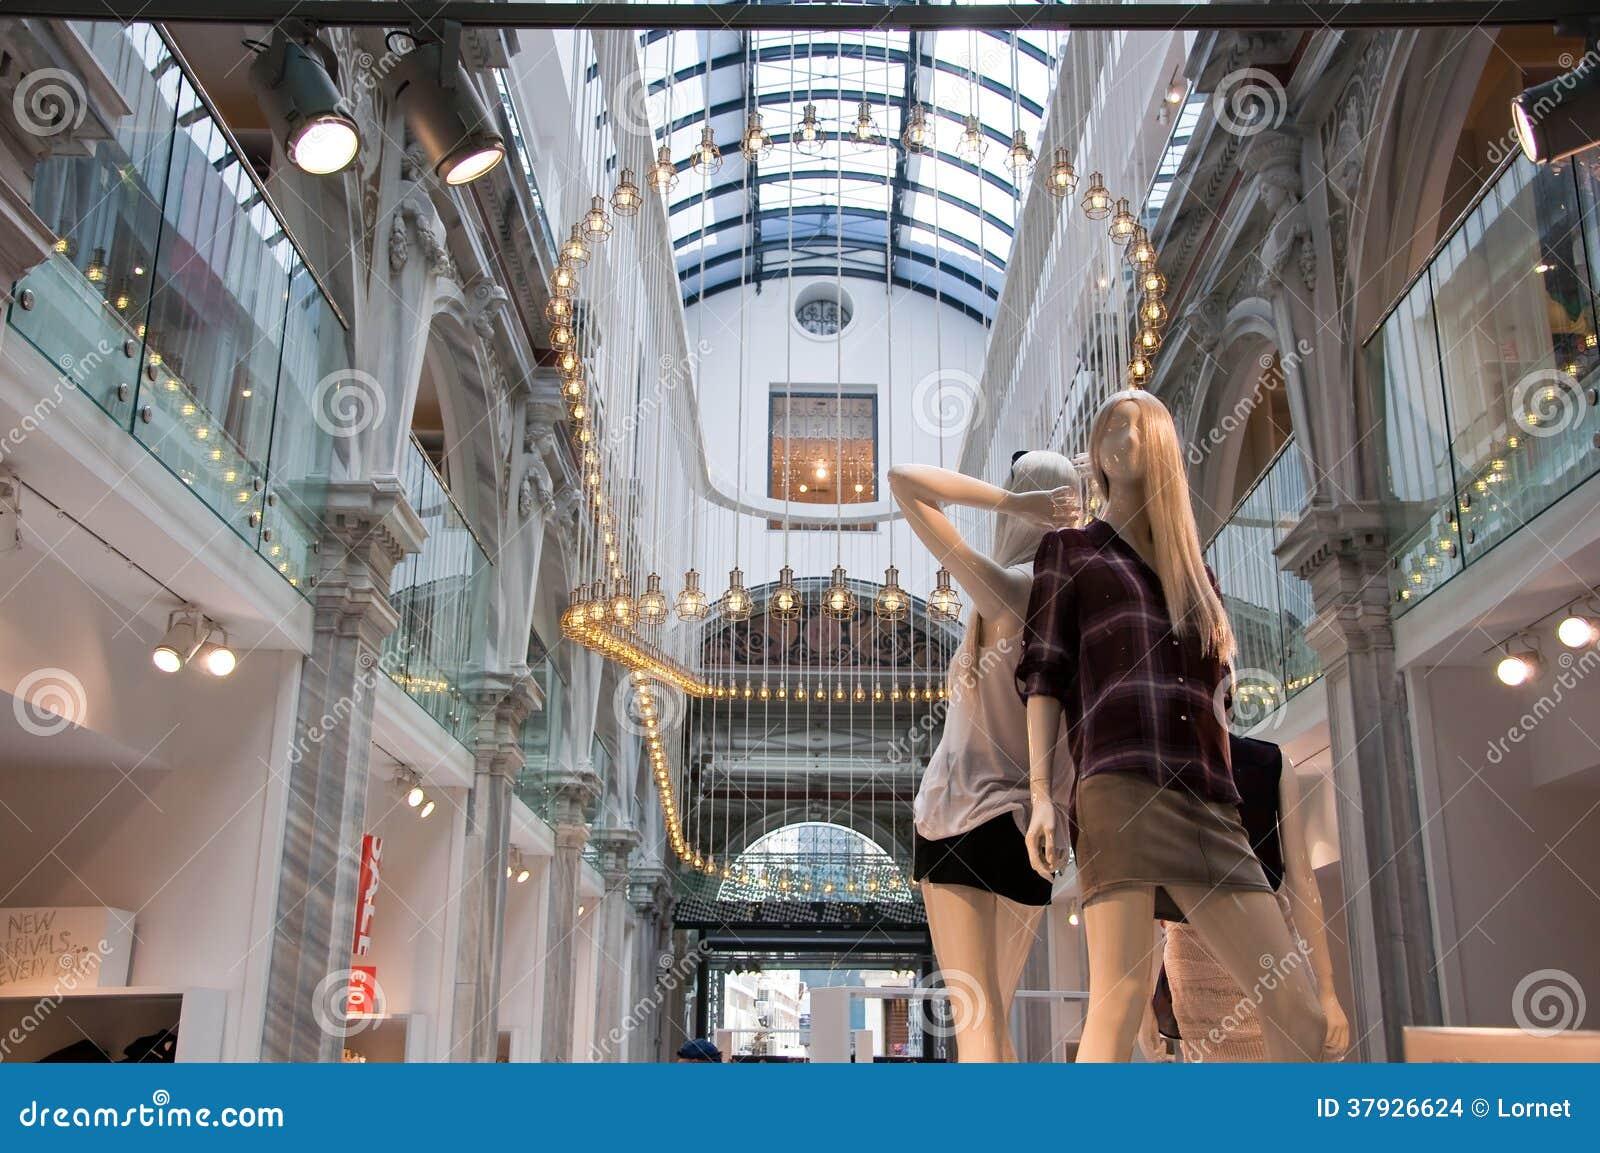 АФИН 1-ОЕ АВГУСТА: Интерьер магазина Zara на улице Ermou 3-его августа 2013 в Афинах Греция